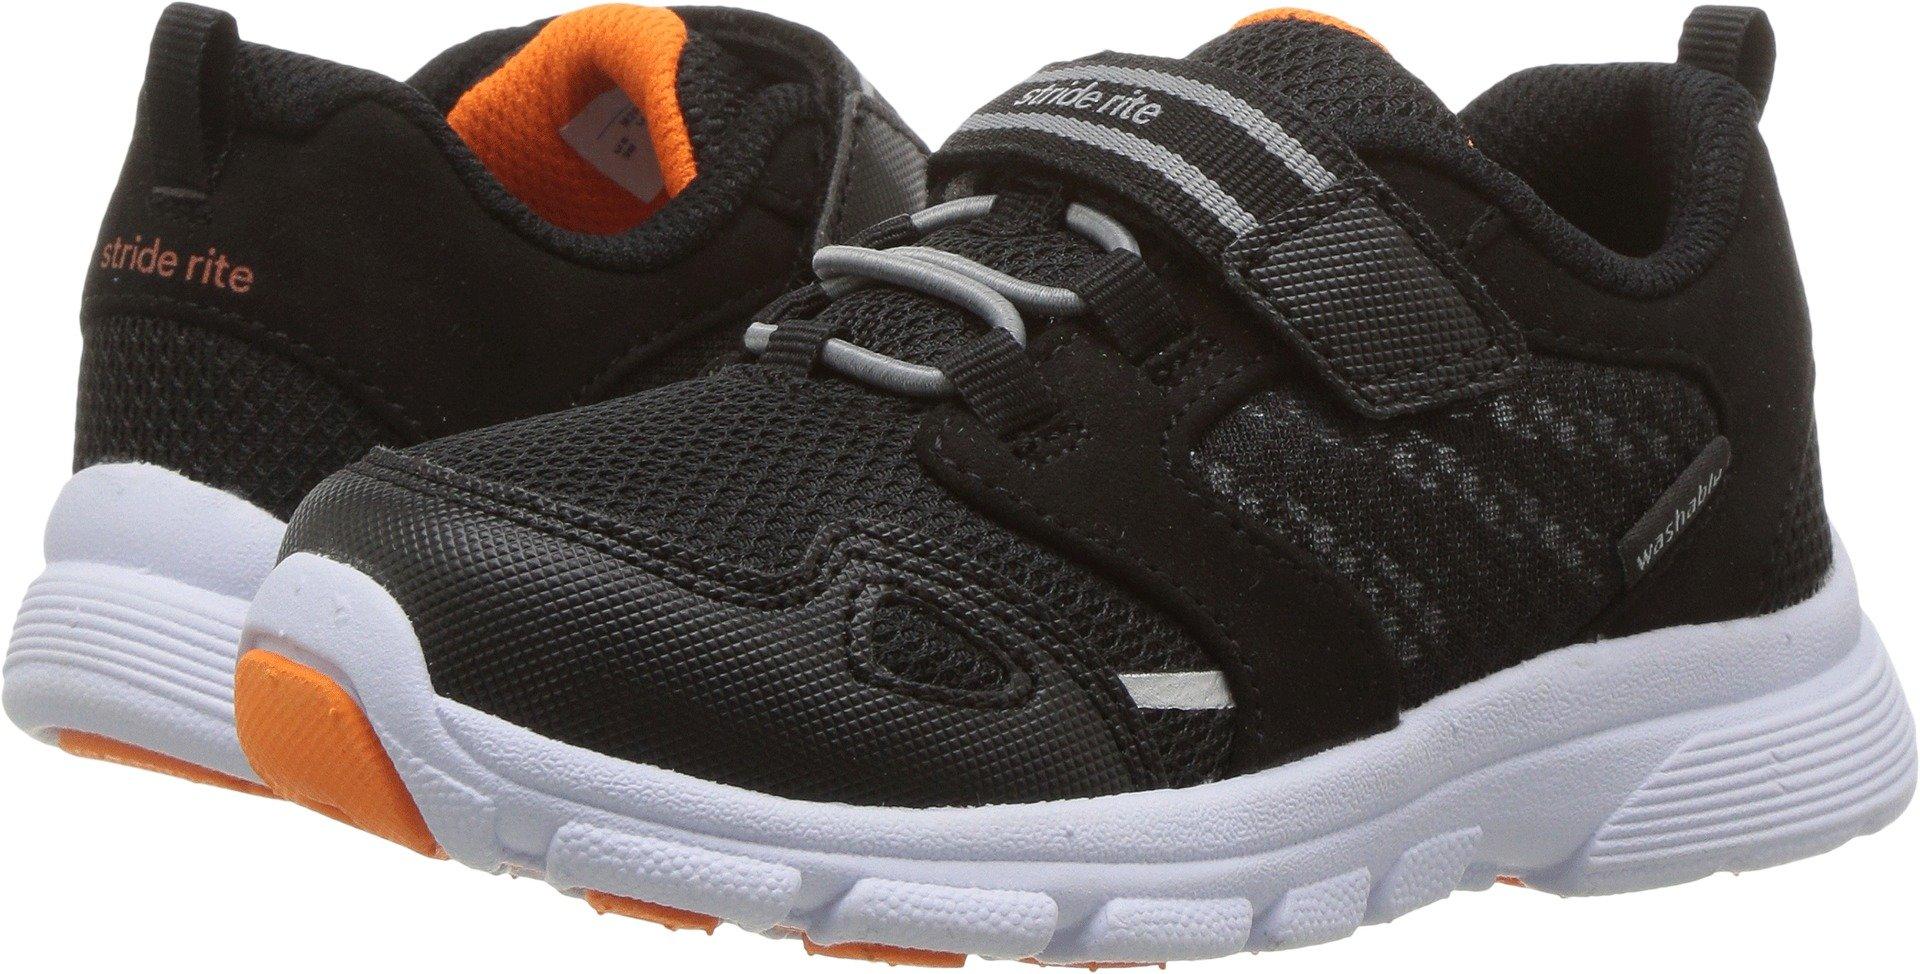 Stride Rite Boys' Made 2 Play Taylor Sneaker, Black/White 9 W US Toddler